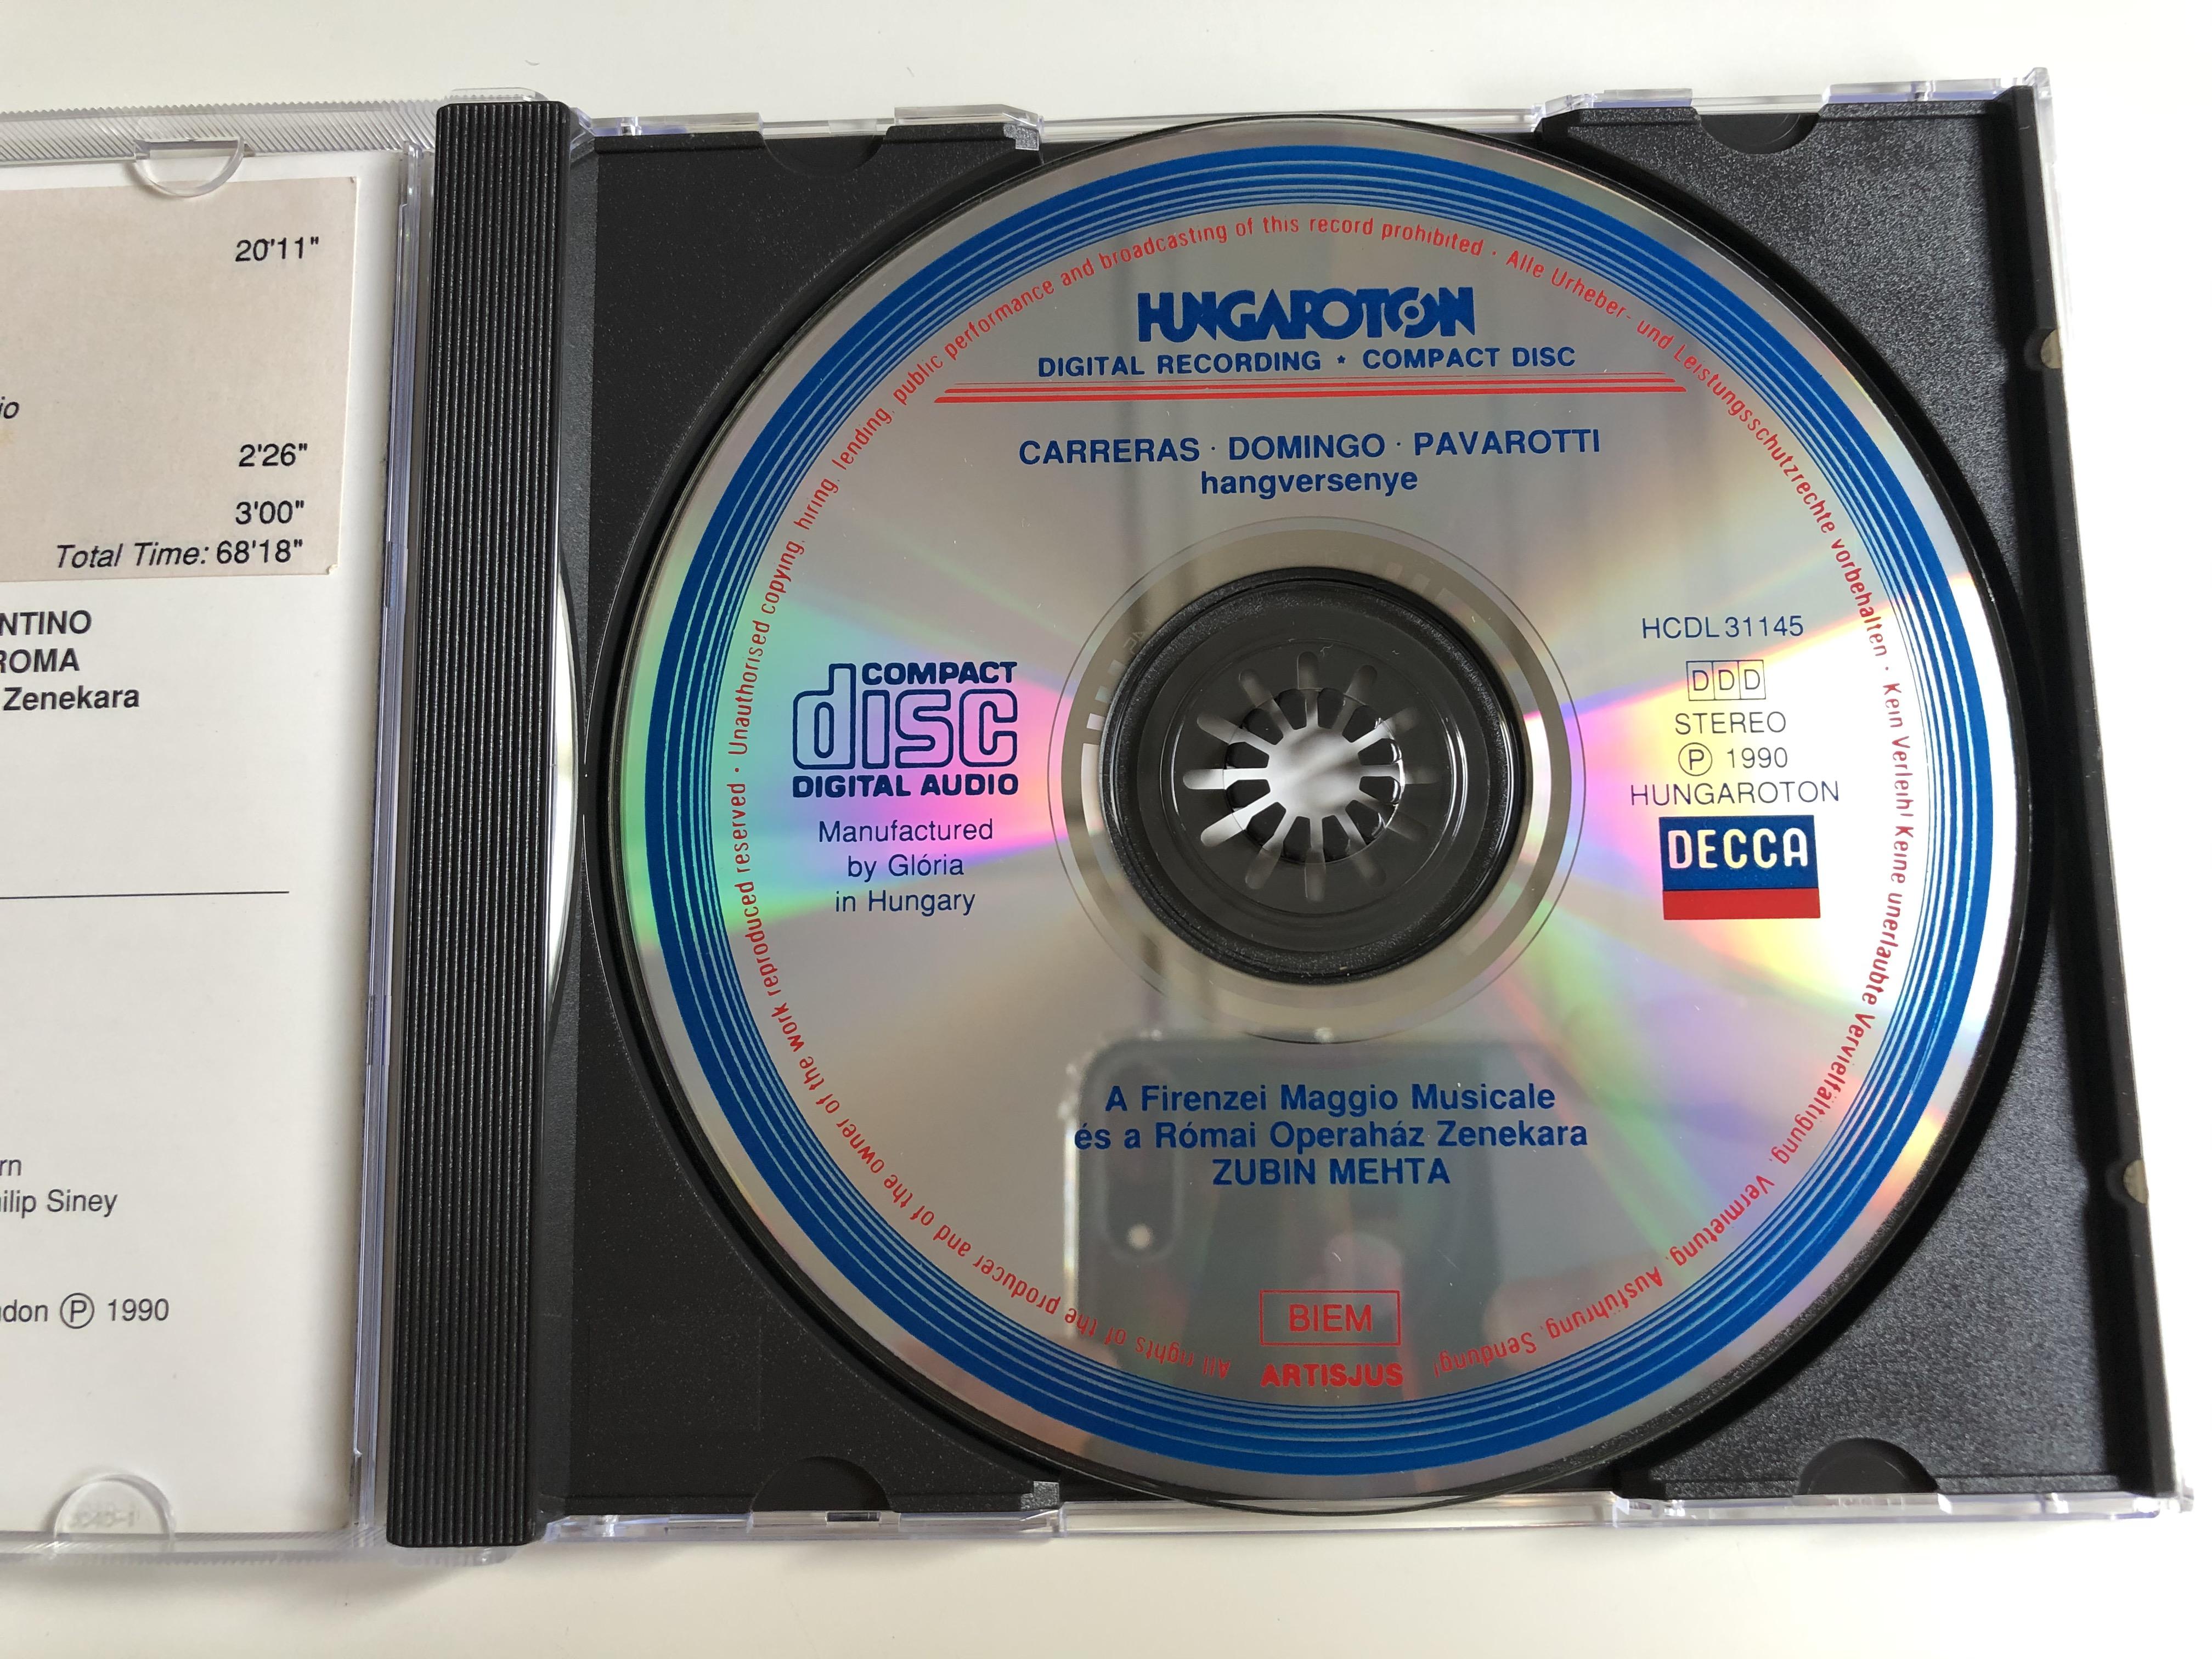 carreras-domingo-pavarotti-mehta-in-concert-hungaroton-audio-cd-1990-stereo-hcdl-31145-4-.jpg